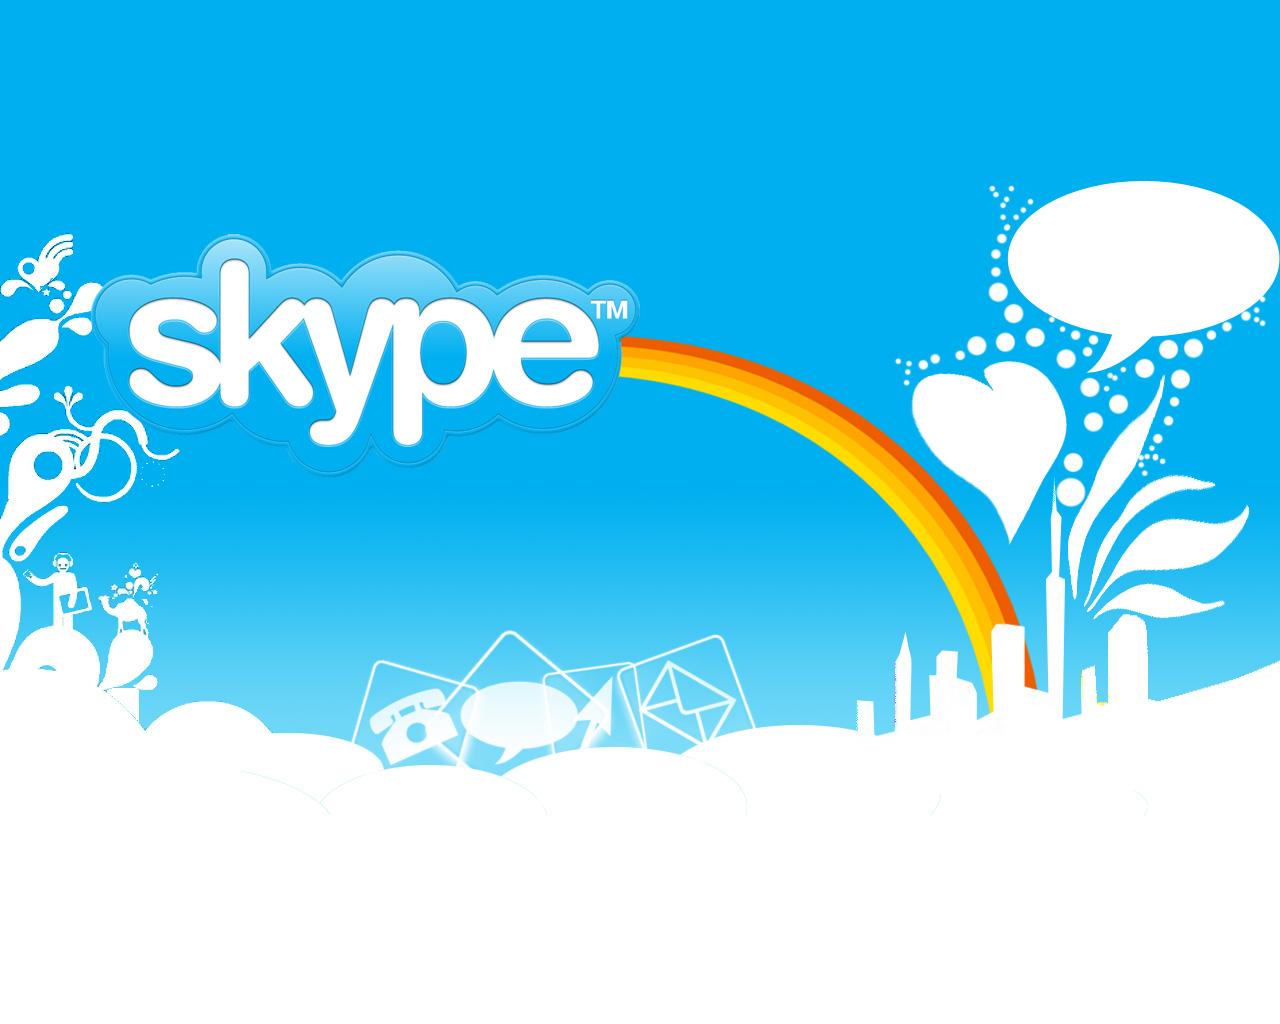 http://4.bp.blogspot.com/-1uQqFGzdUOI/TadcWaOVOgI/AAAAAAAAAAM/Br_L39c3QjA/s1600/Skype_Wallpaper_by_MSTTMZ.jpg